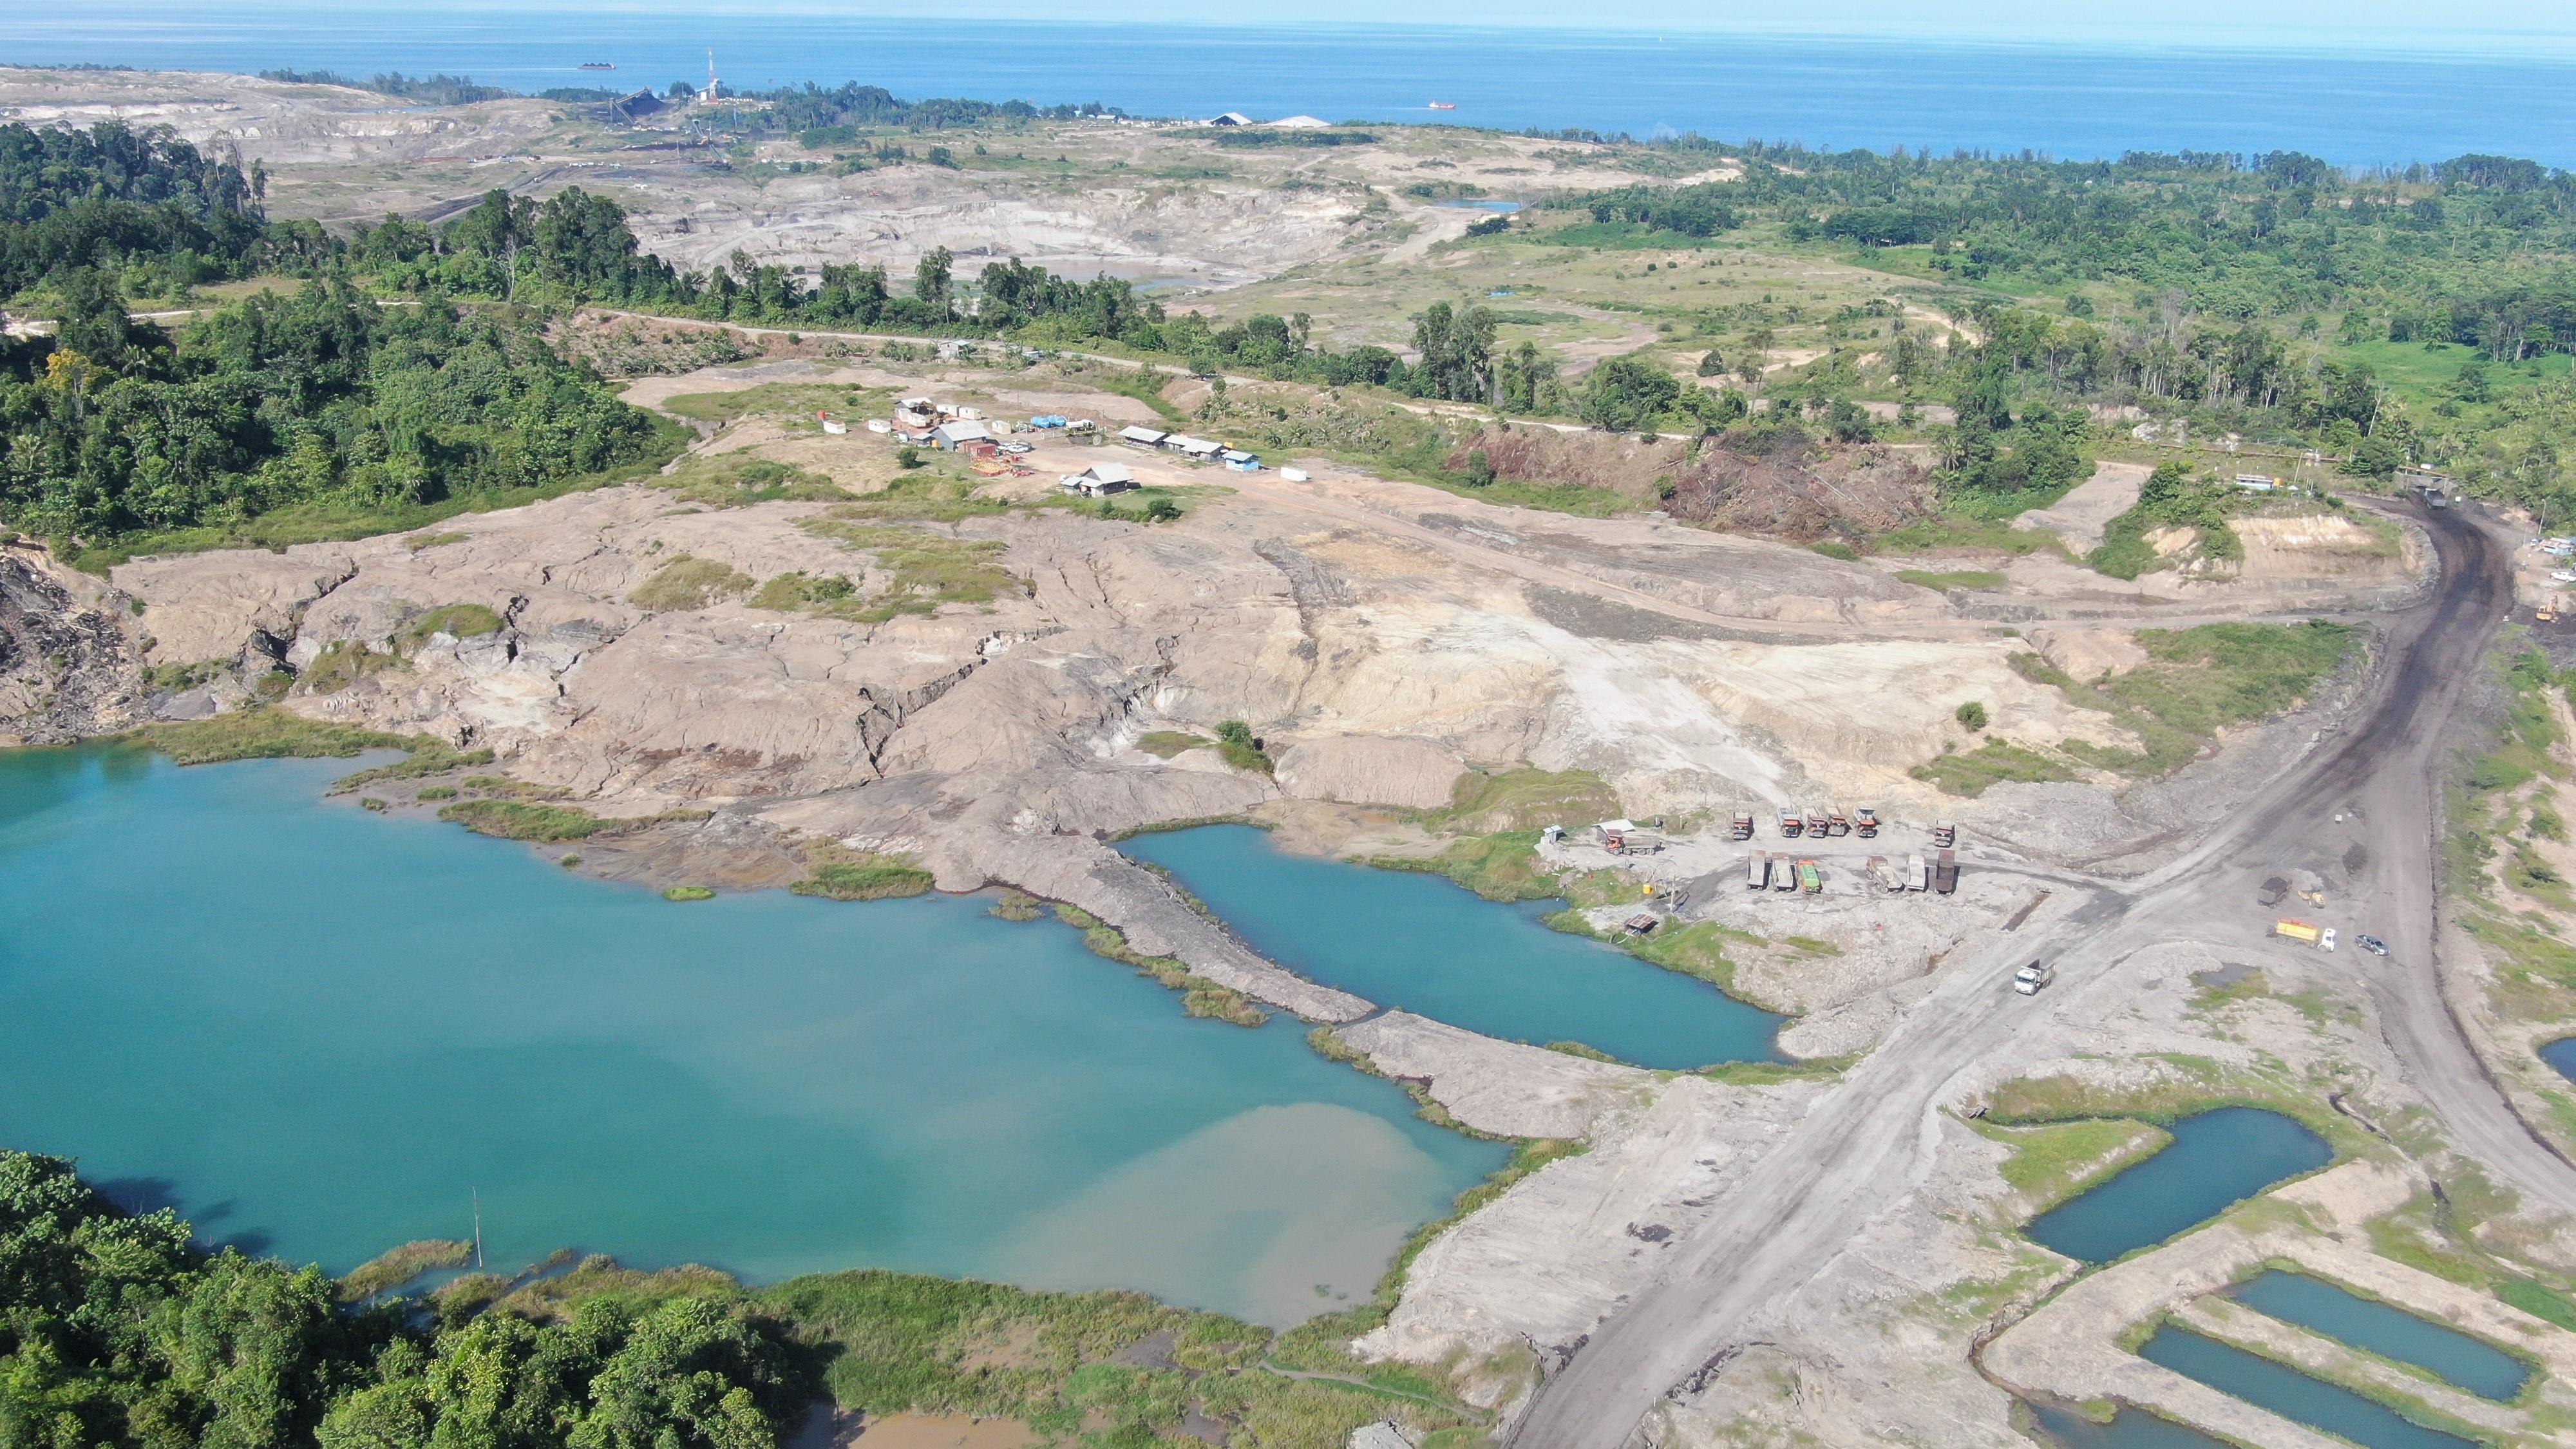 Adani's coal mine on the small island of Bunyu is in close proximity to the sea. Photo JATAM